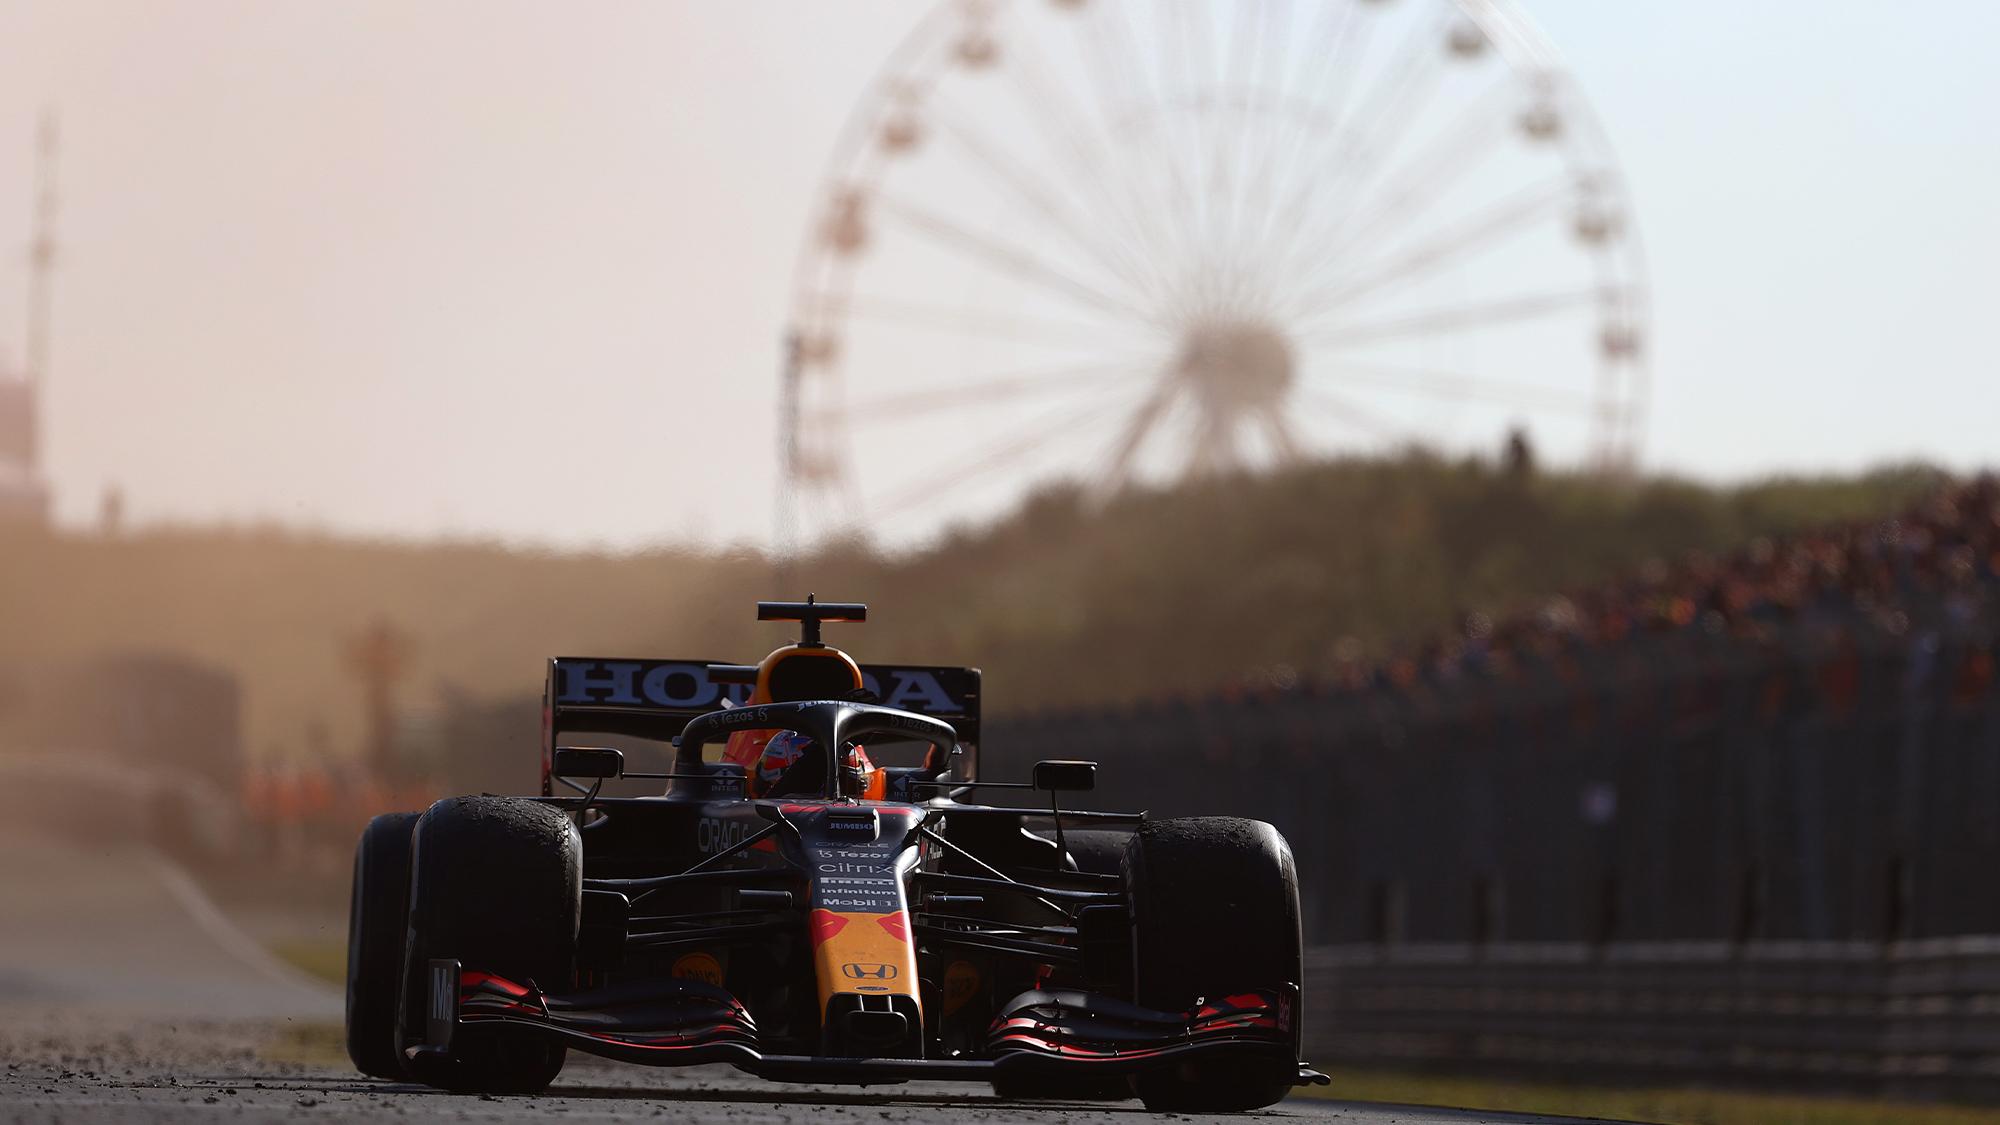 Max Verstappen drives through orange flare smoke at the 2021 Dutch GP